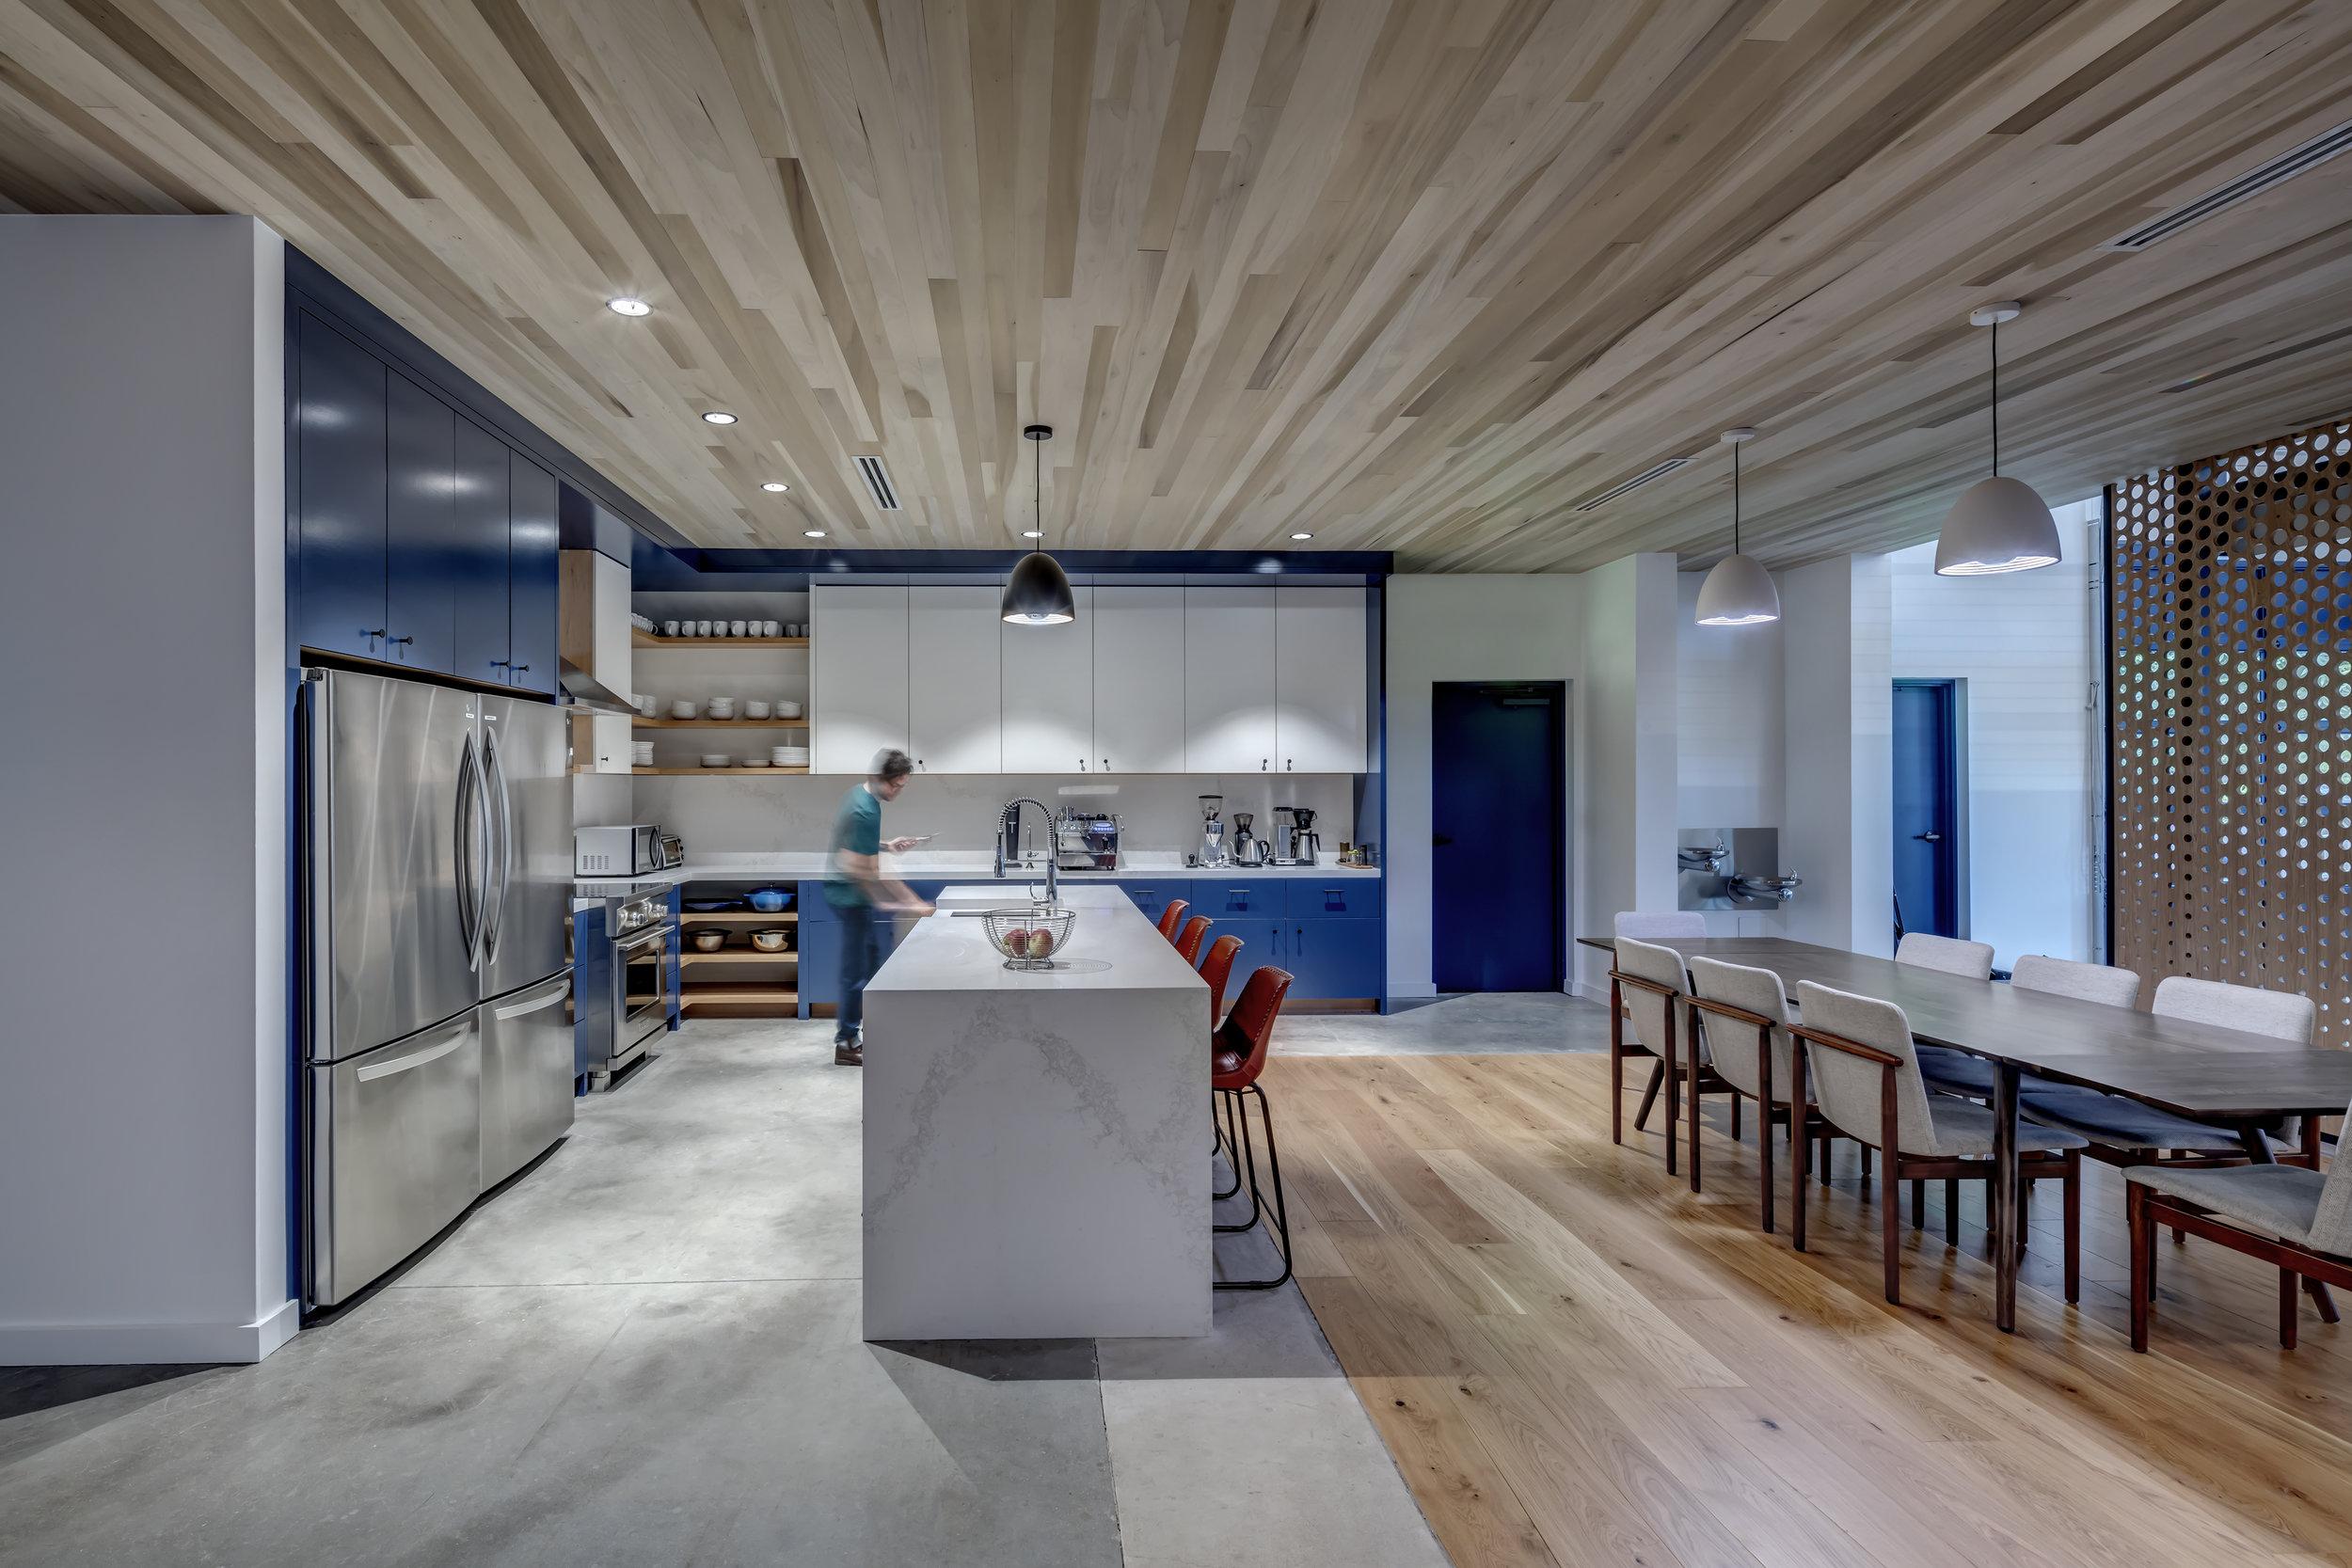 JDI Office by Matt Fajkus MF Architecture. Photo 11 by Charles Davis Smith.jpg